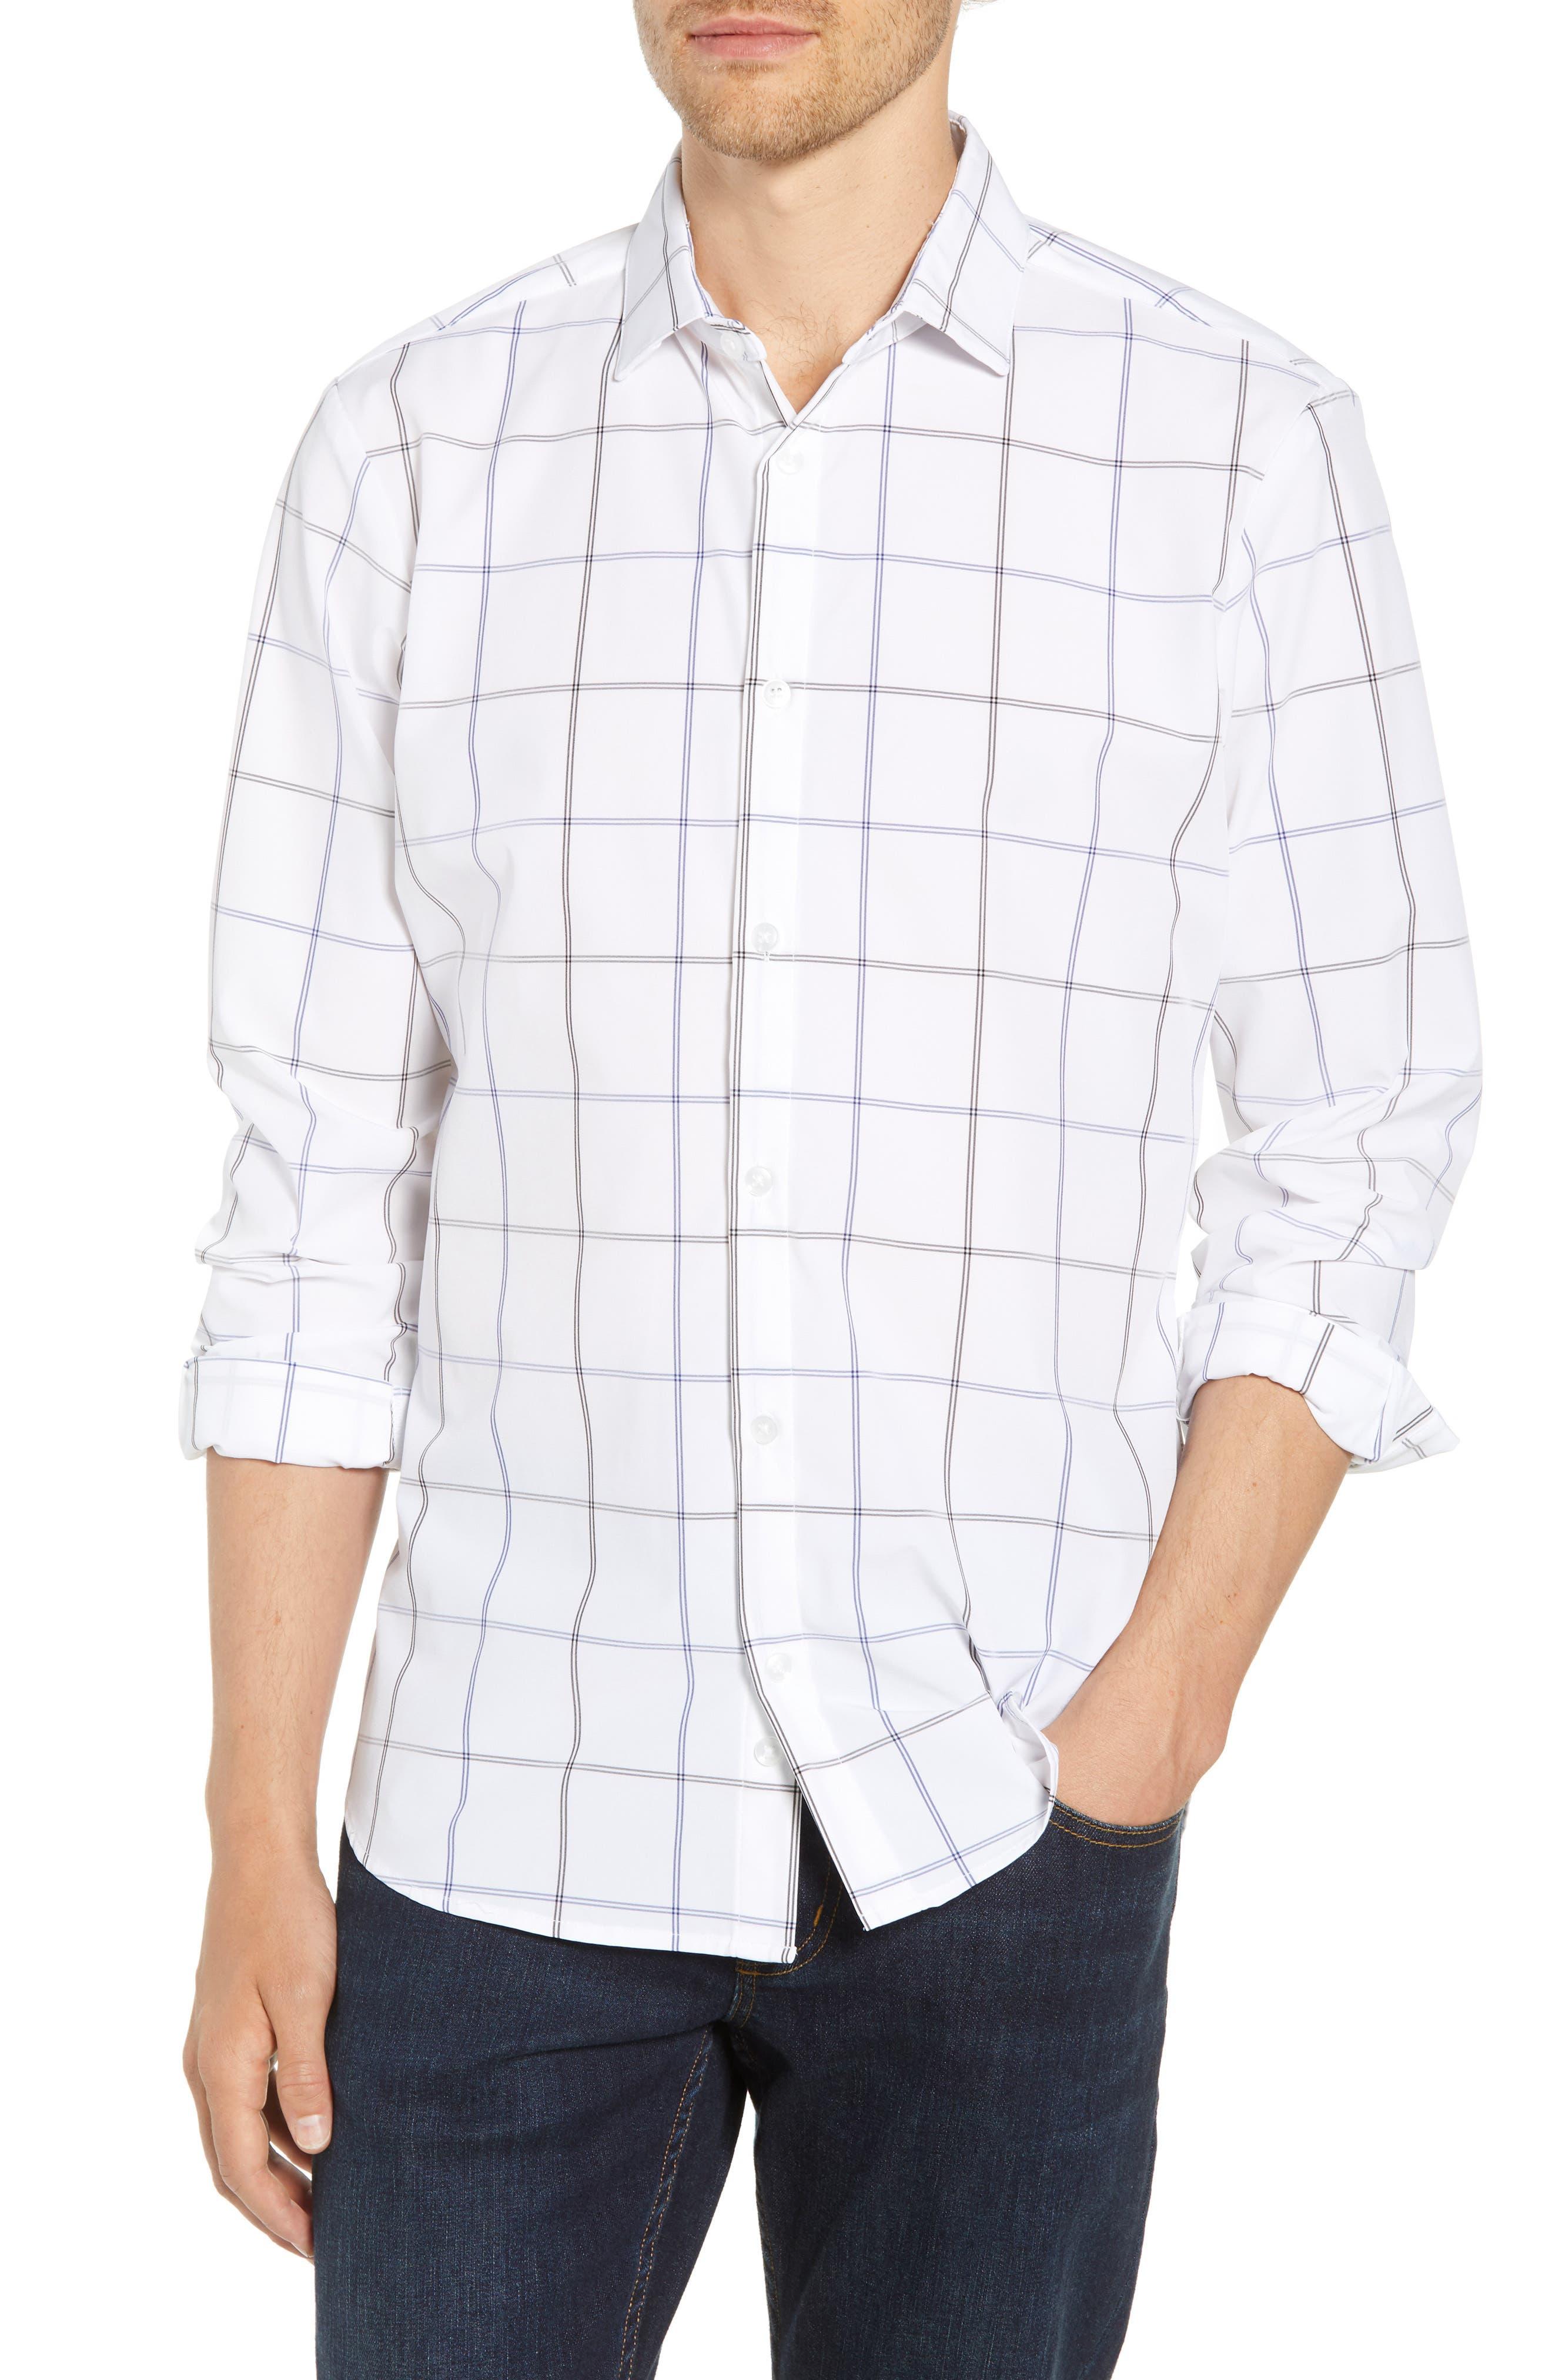 Crossman Slim Fit Grid Performance Sport Shirt,                         Main,                         color, White